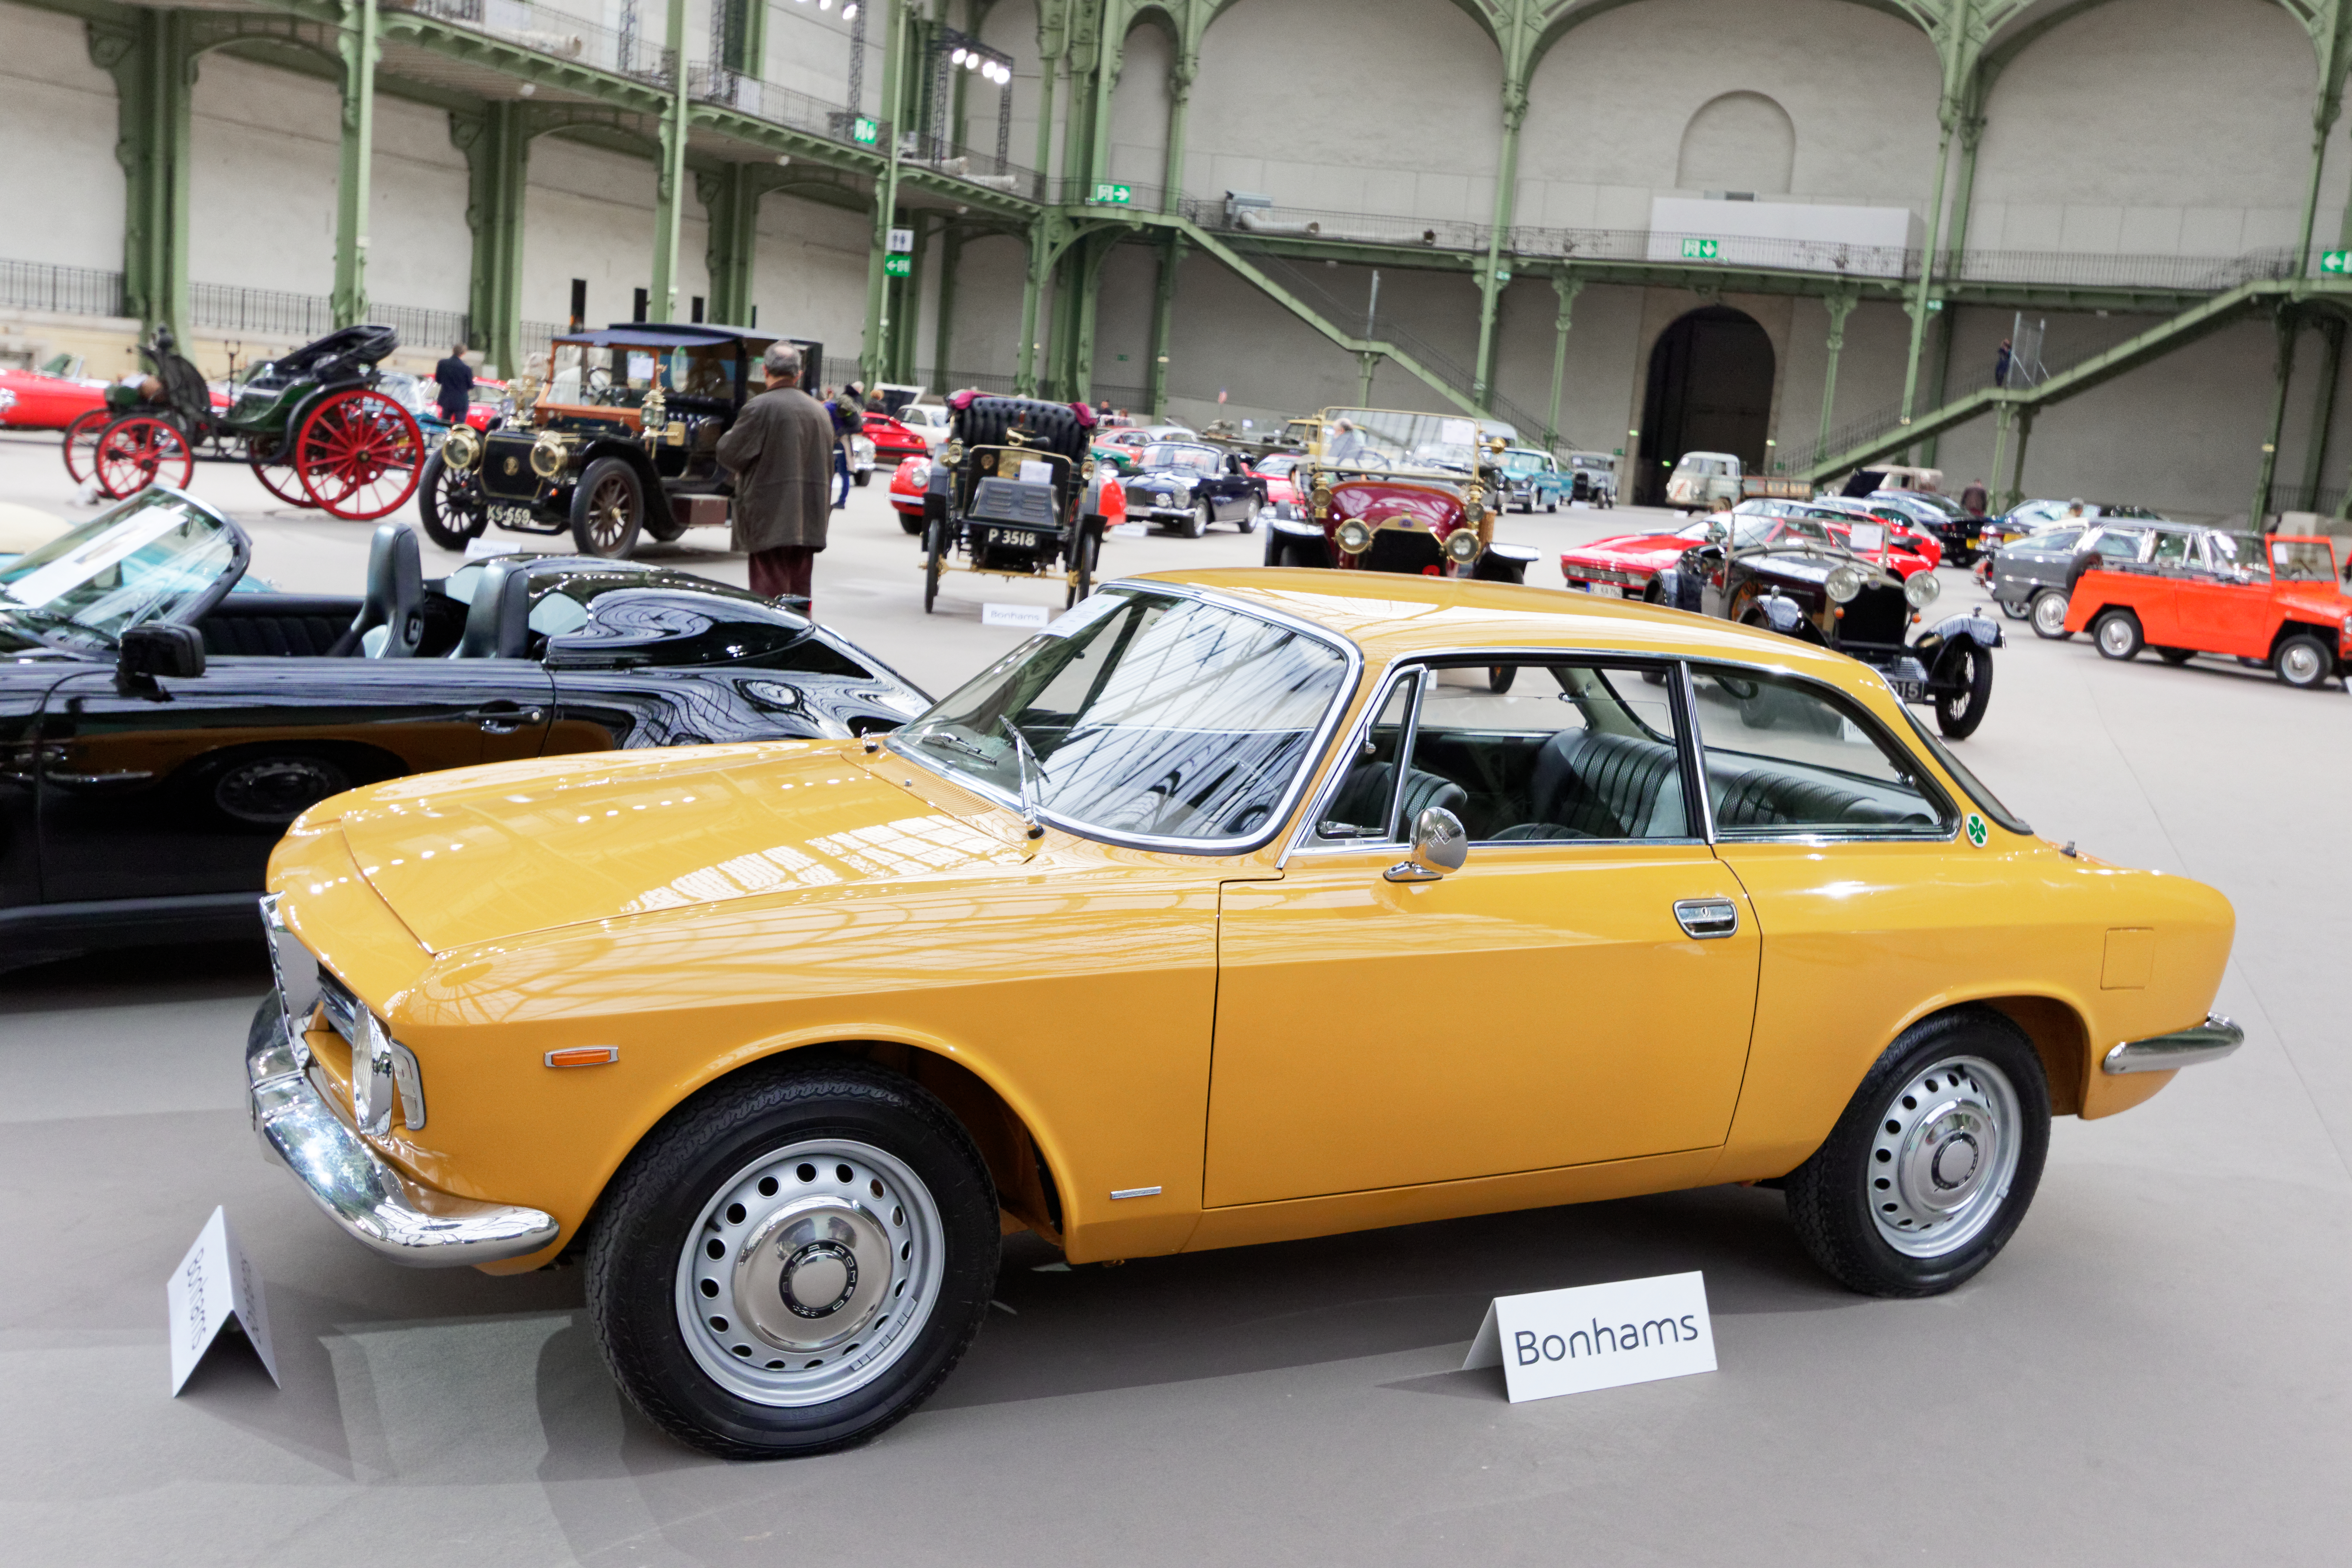 File:Paris - Bonhams 2017 - Alfa Romeo Giulia Sprint GT Veloce - 1967 -